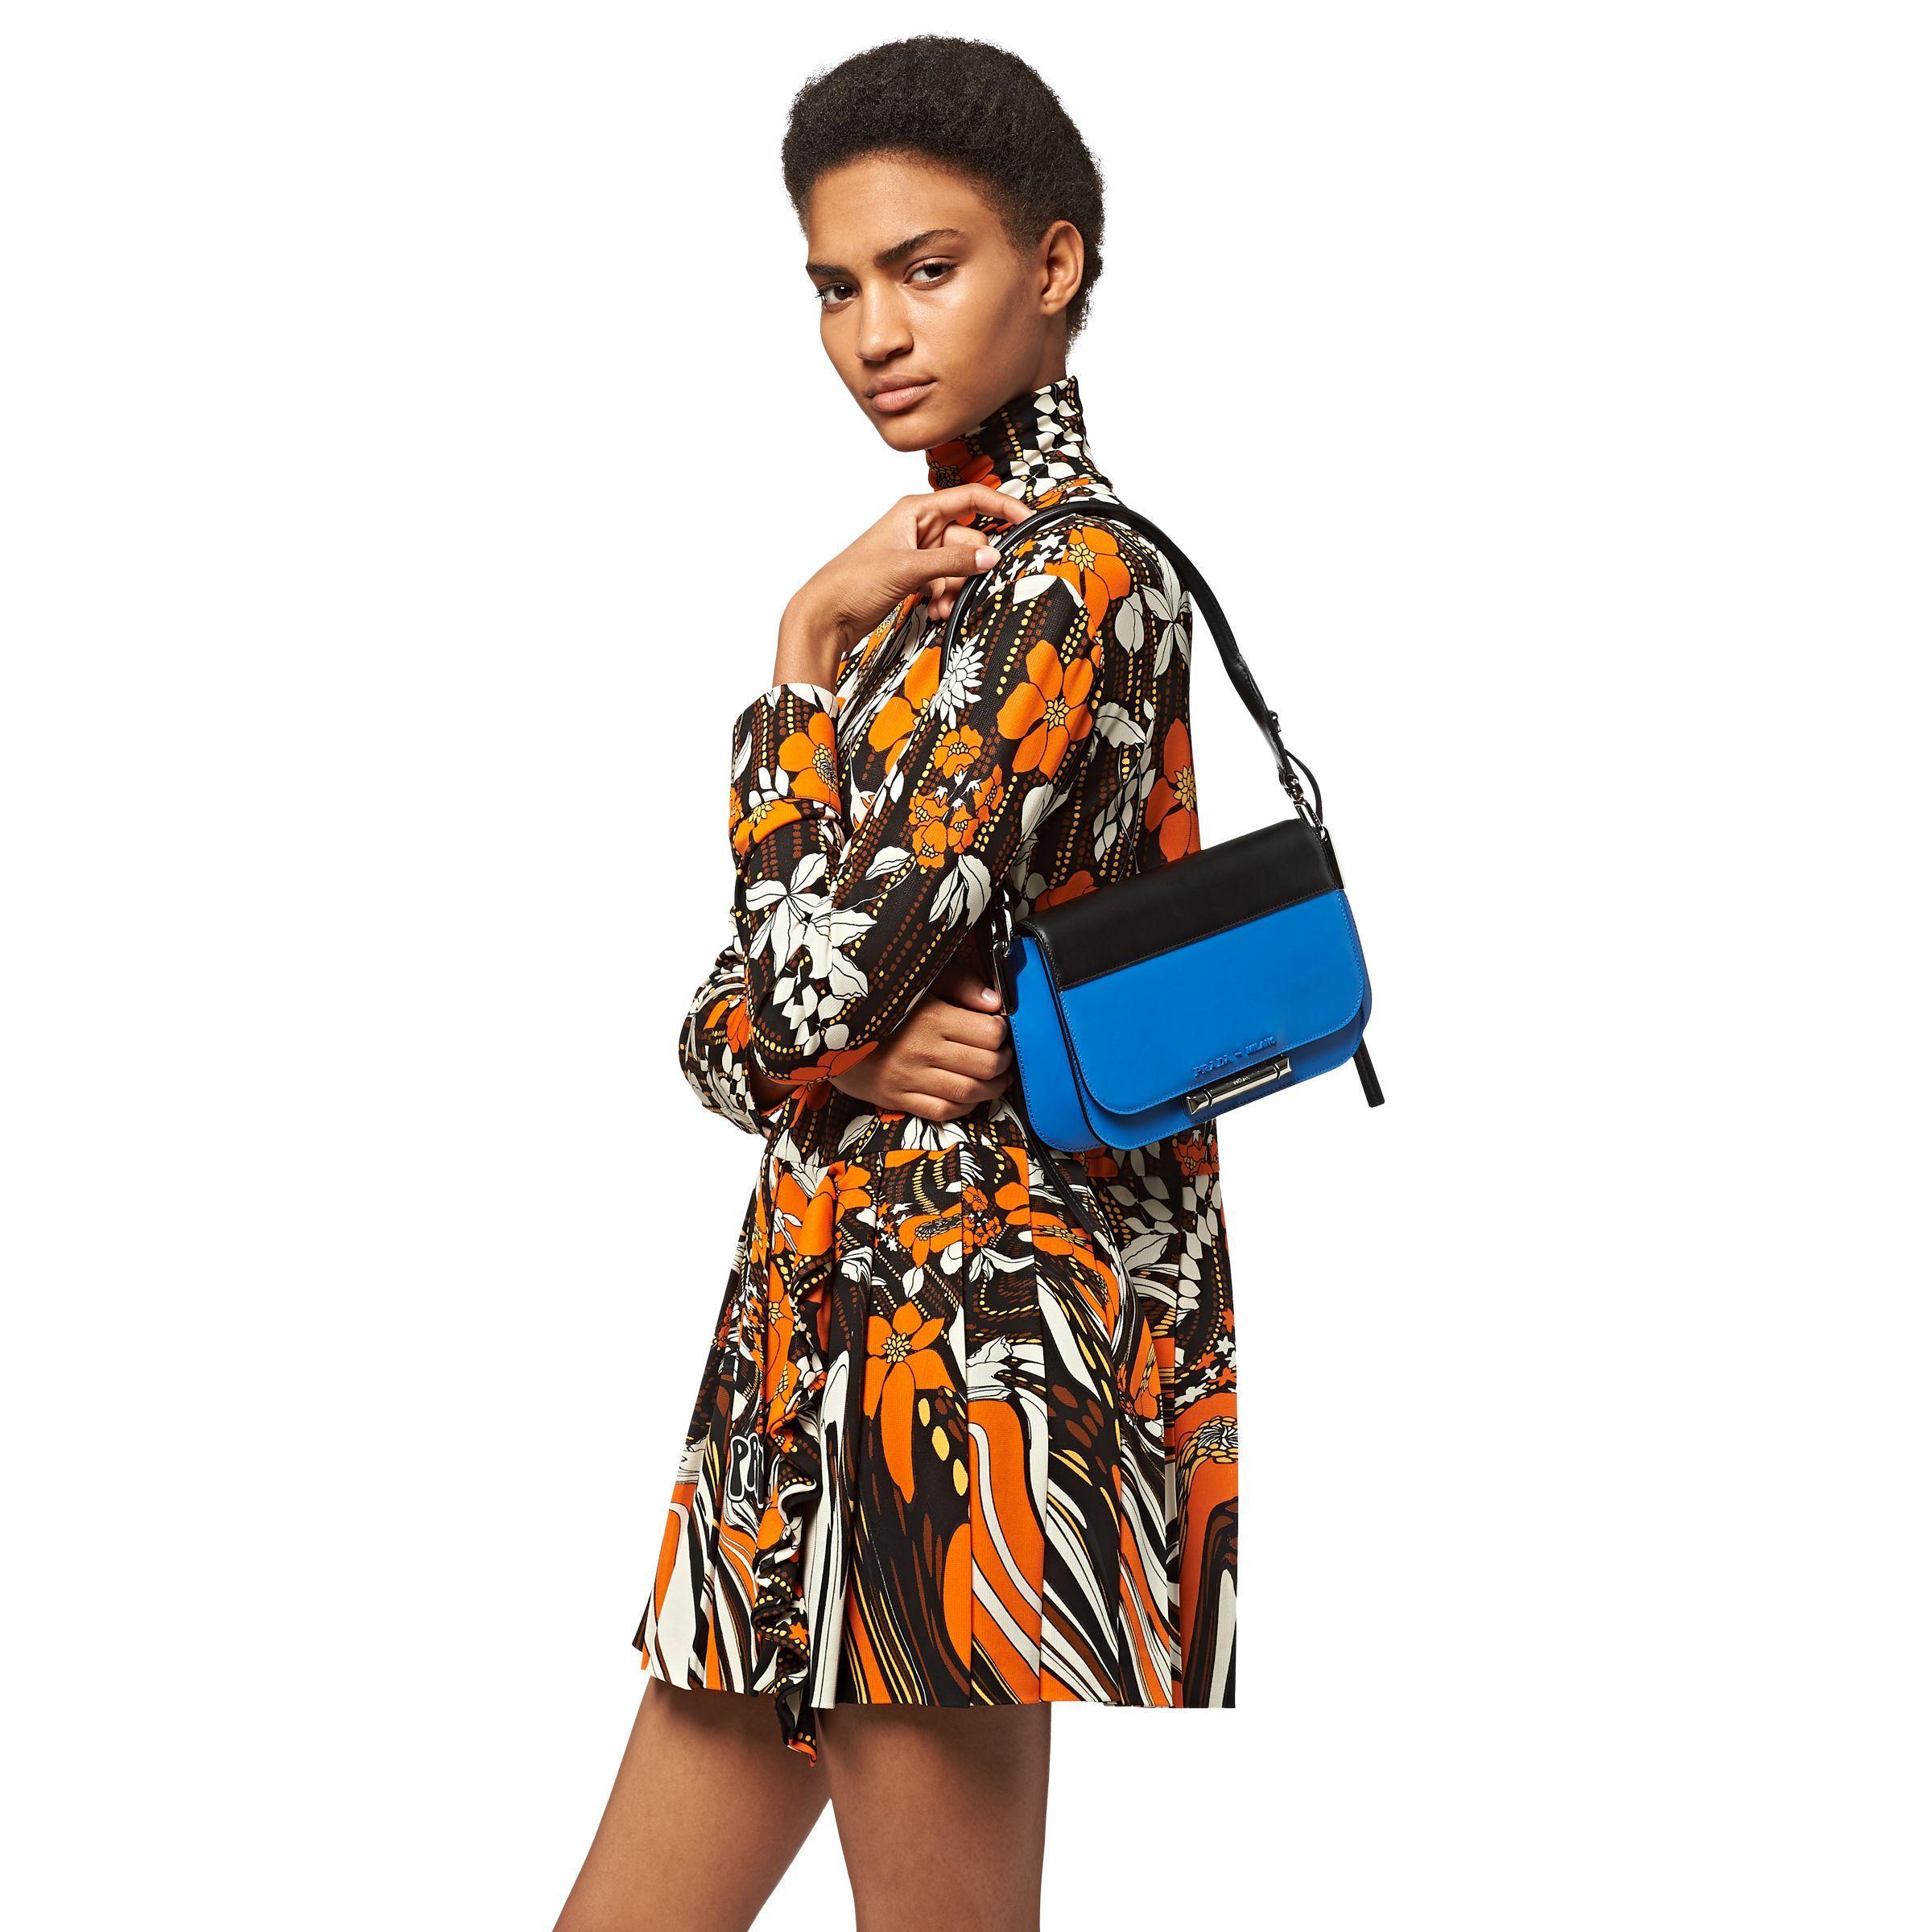 6b2525c356e4 Prada Sybille Leather Shoulder Bag in Blue - Lyst